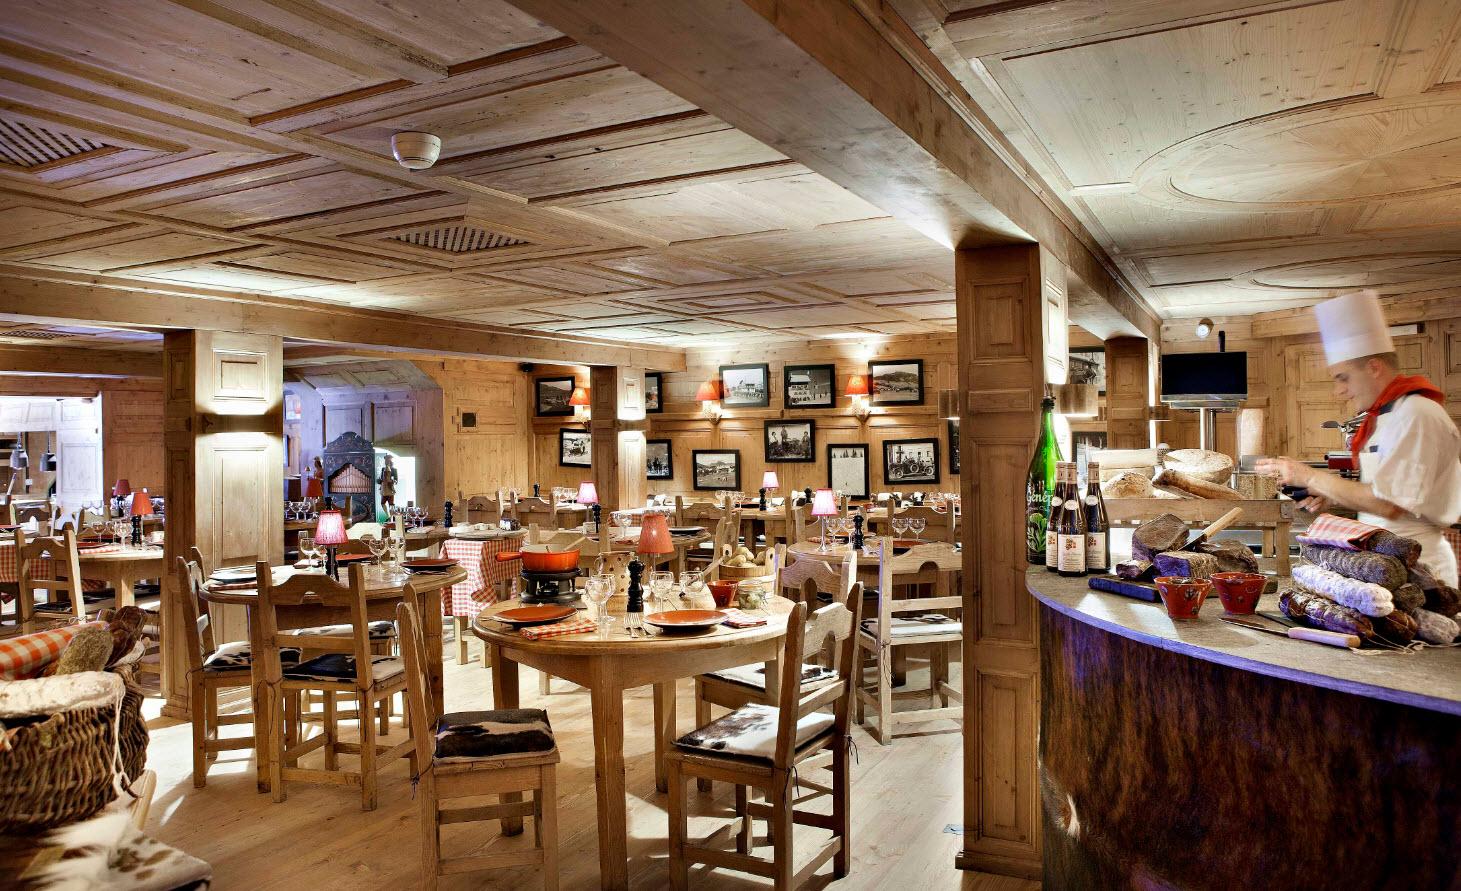 Manger Megève - Restaurant alpin Fermes Marie (c) L. Di Orio, MPM, T. Shu & DR